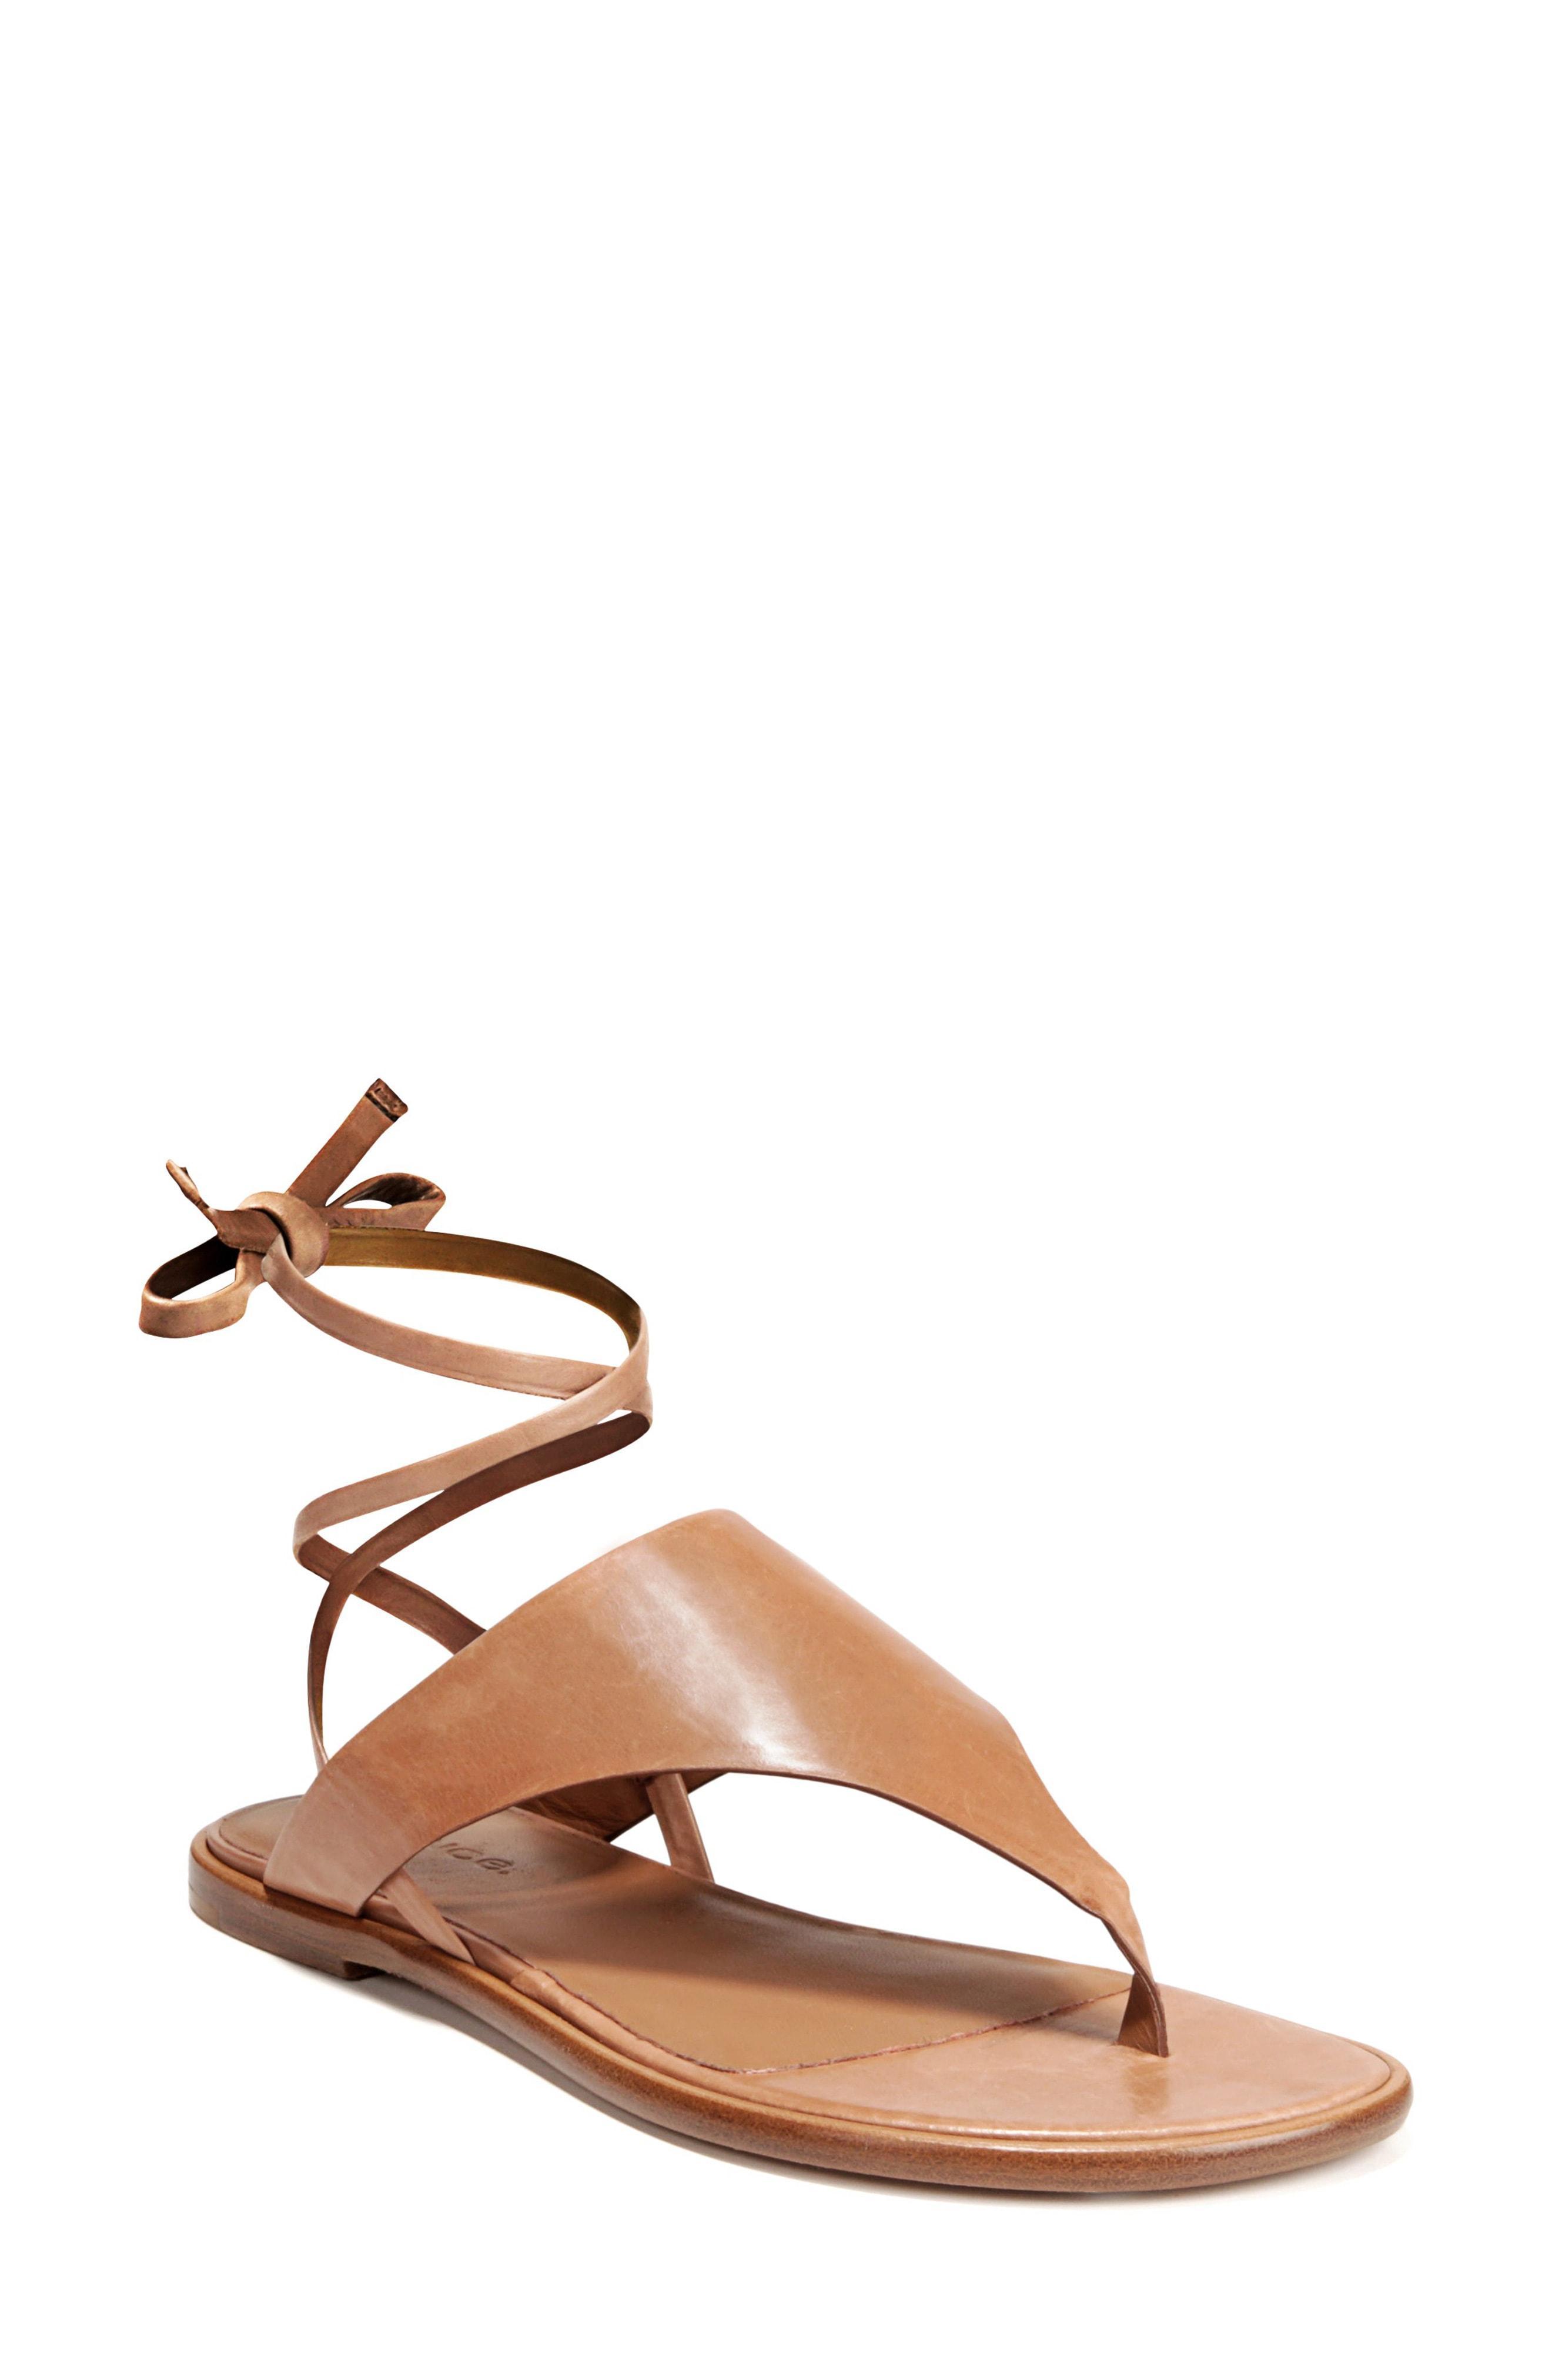 a98a4cfc433 Vince. Women s Eastwood V-strap Wraparound Sandal